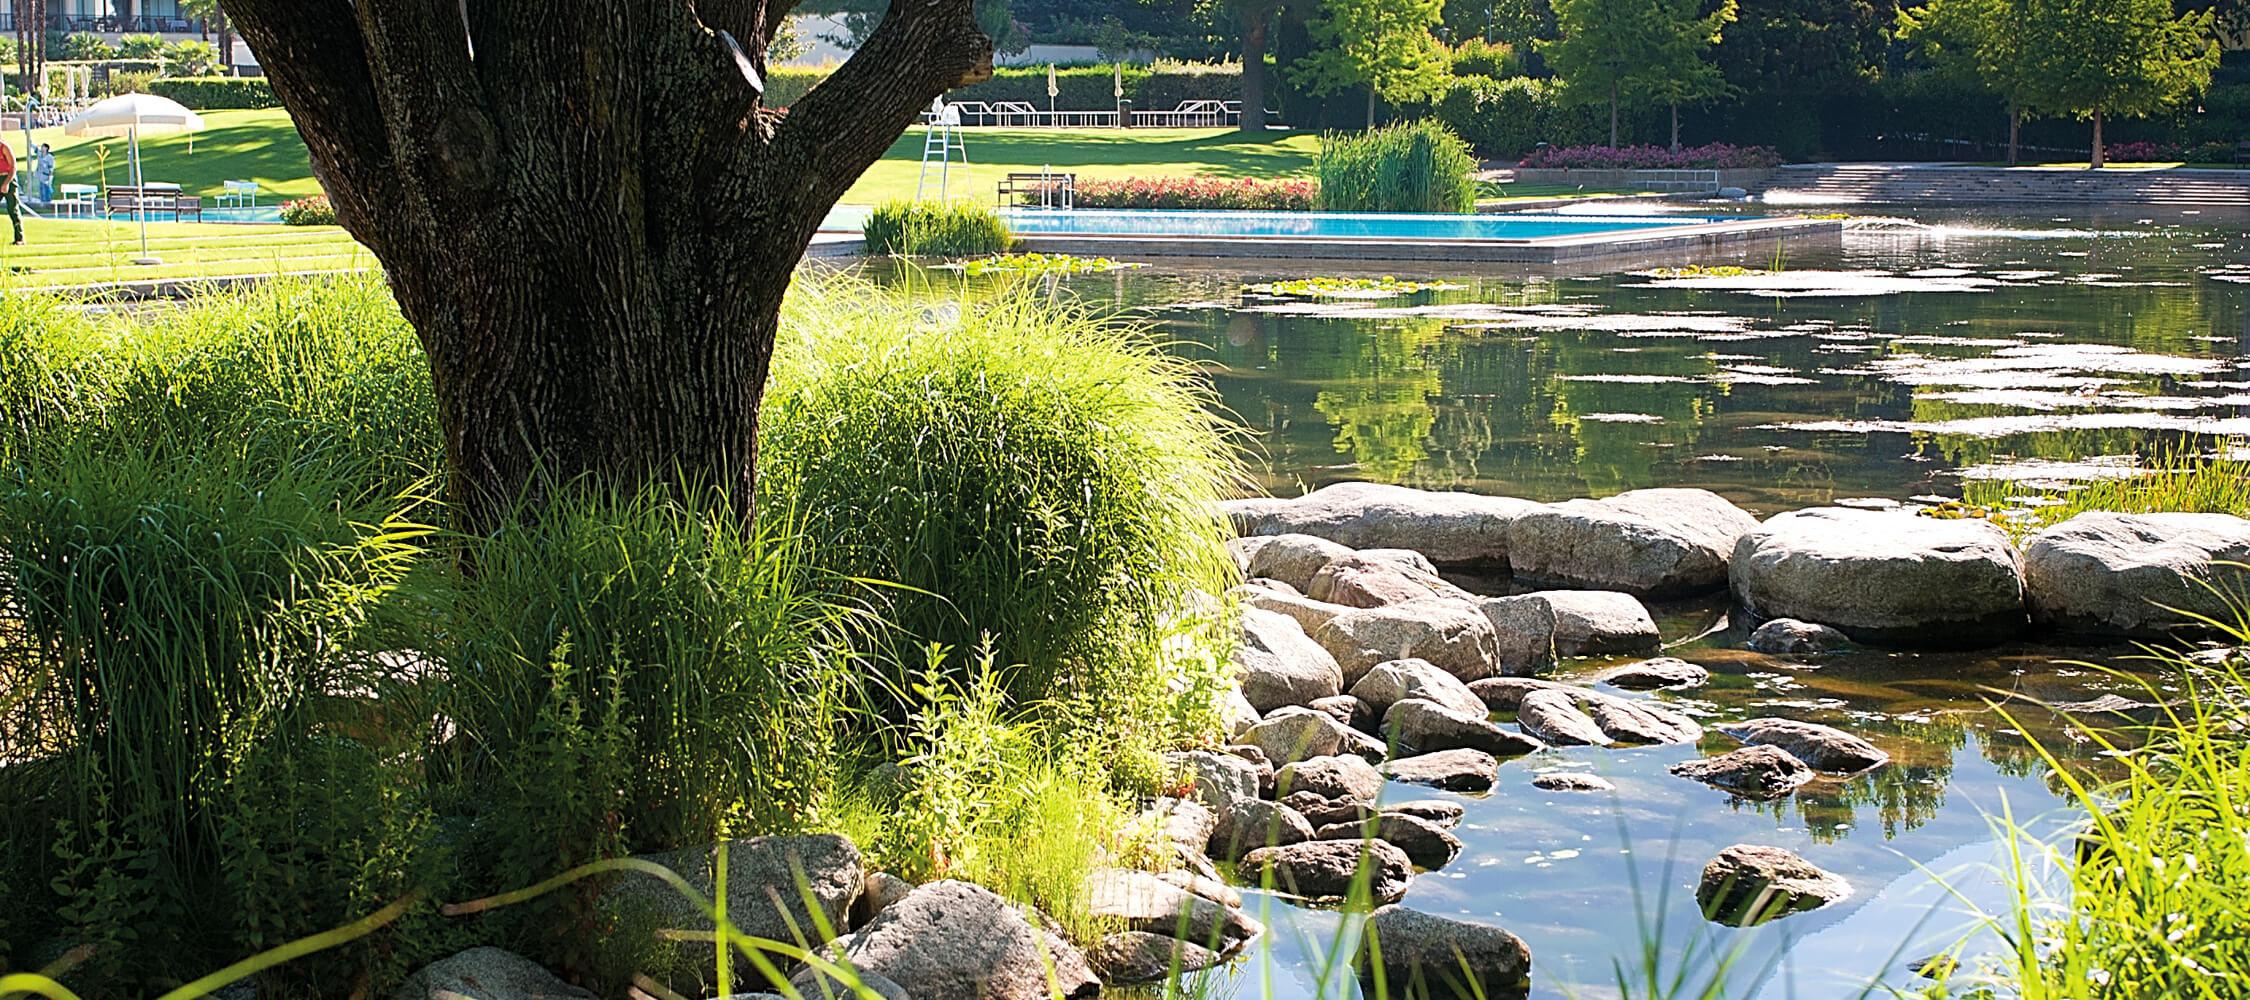 Italien-Trentino_Suedtirol_Alto_Adige_Merano_Meran_Therme_Pool_Aussen_Park_Wasser_Schwimmbad_DOCsrl_02_2250x1000